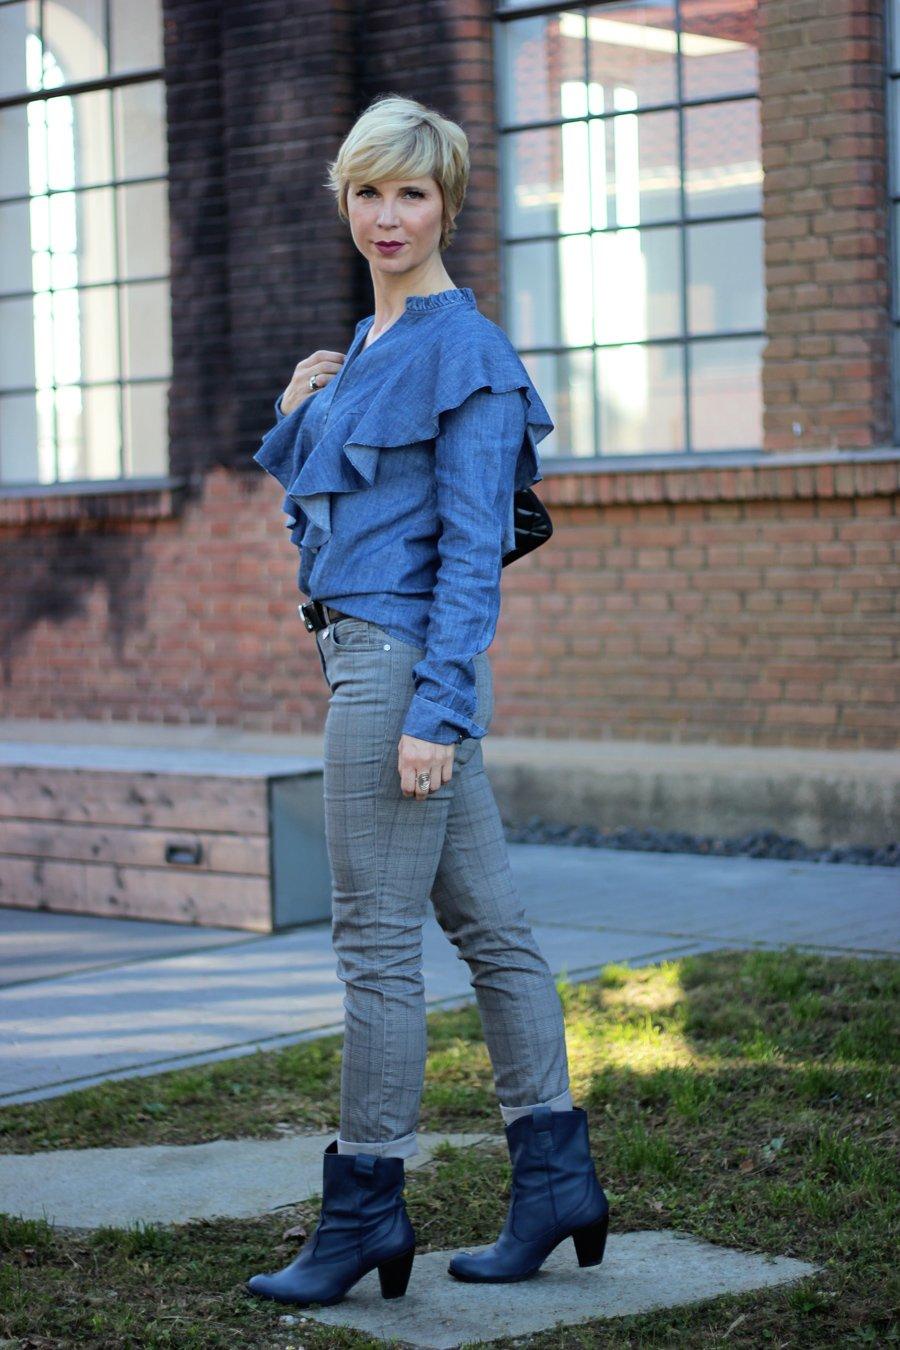 conny doll lifestyle: Unterwegs in Sachen Beauty - Karo meets Rüschen, Toni Fashion, Cowboystiefel, Rüschenbluse, casual Styling